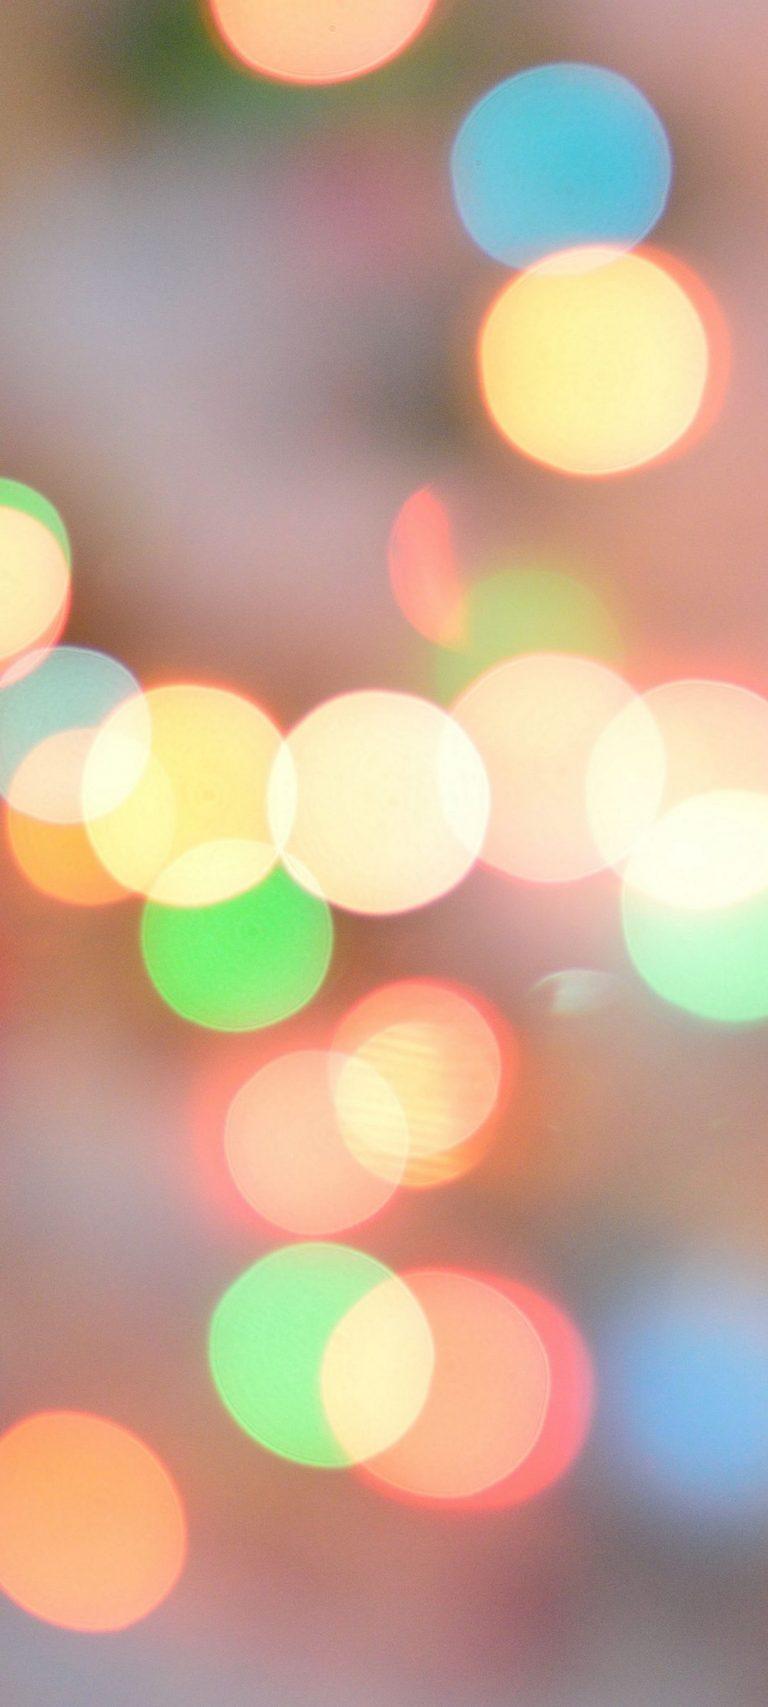 Glare Abstract Circles Shine 1080x2400 768x1707